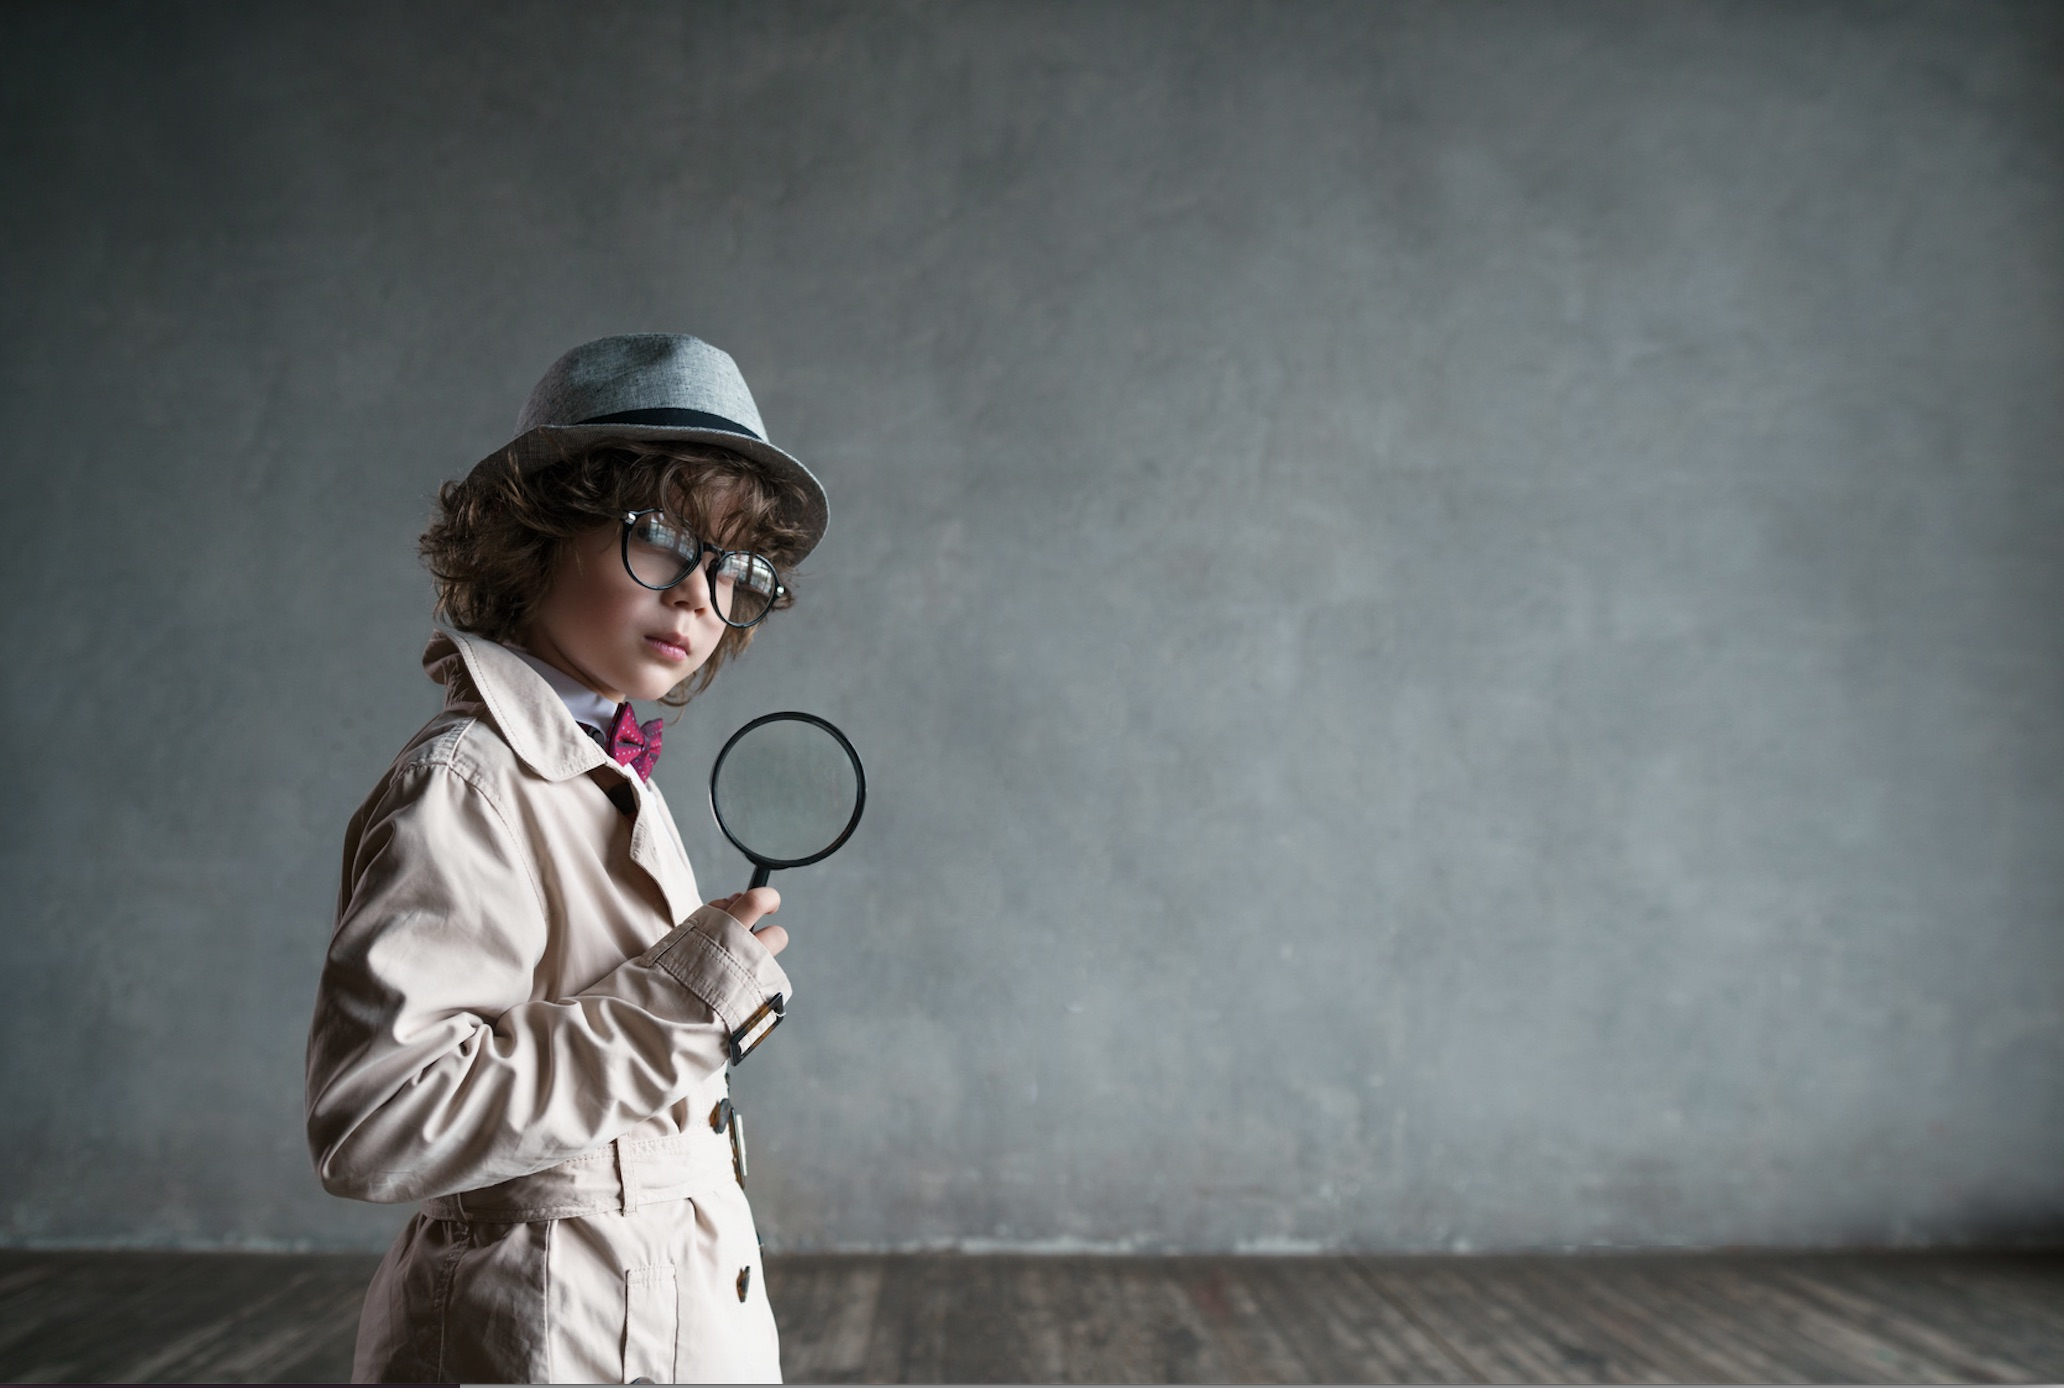 SAP Hybris retires YaaS io - where do SAP microservices go